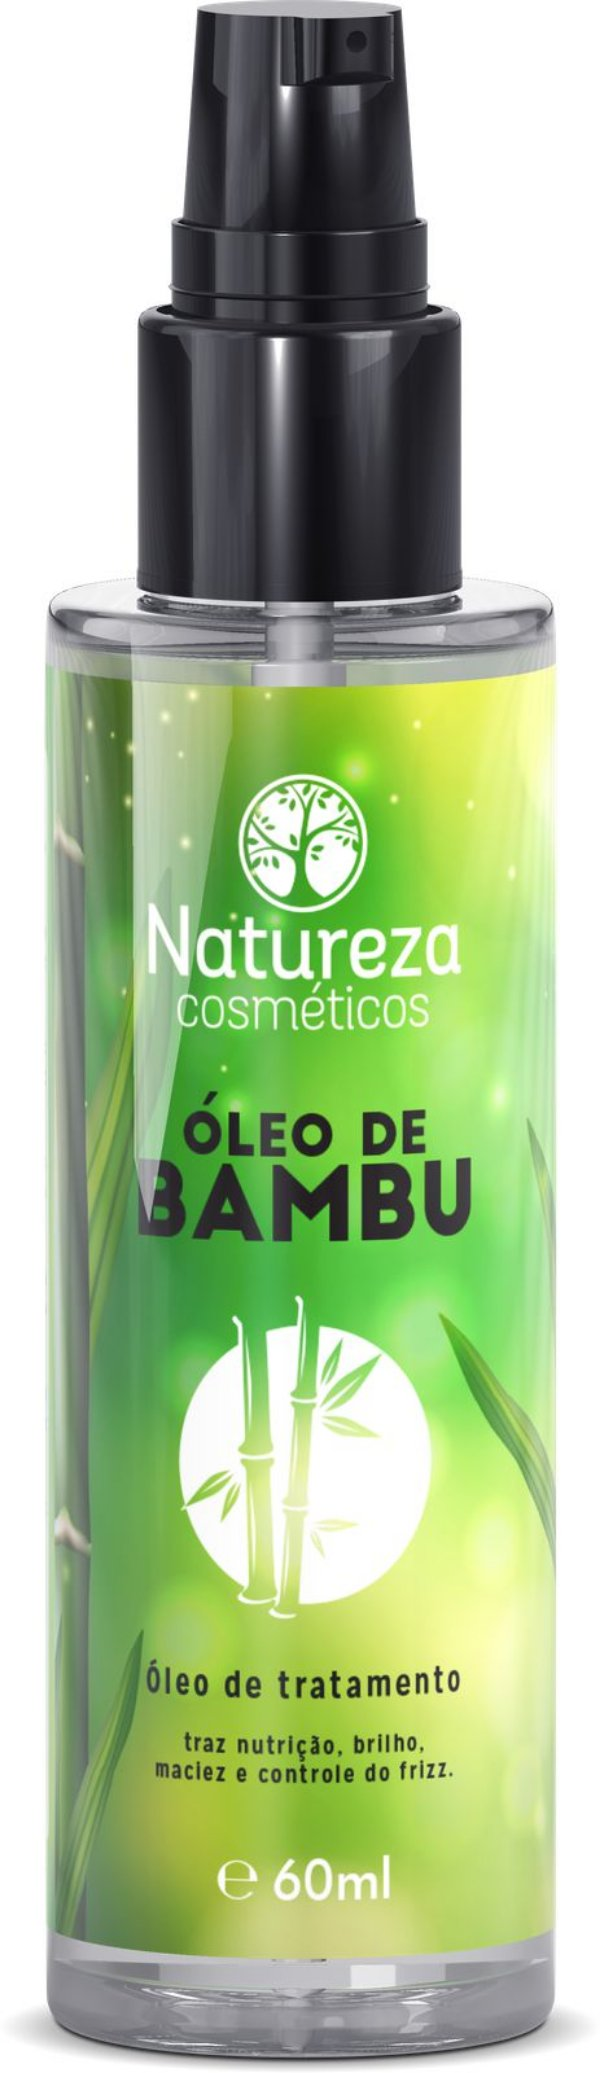 ÓLEO DE BAMBU 60ml